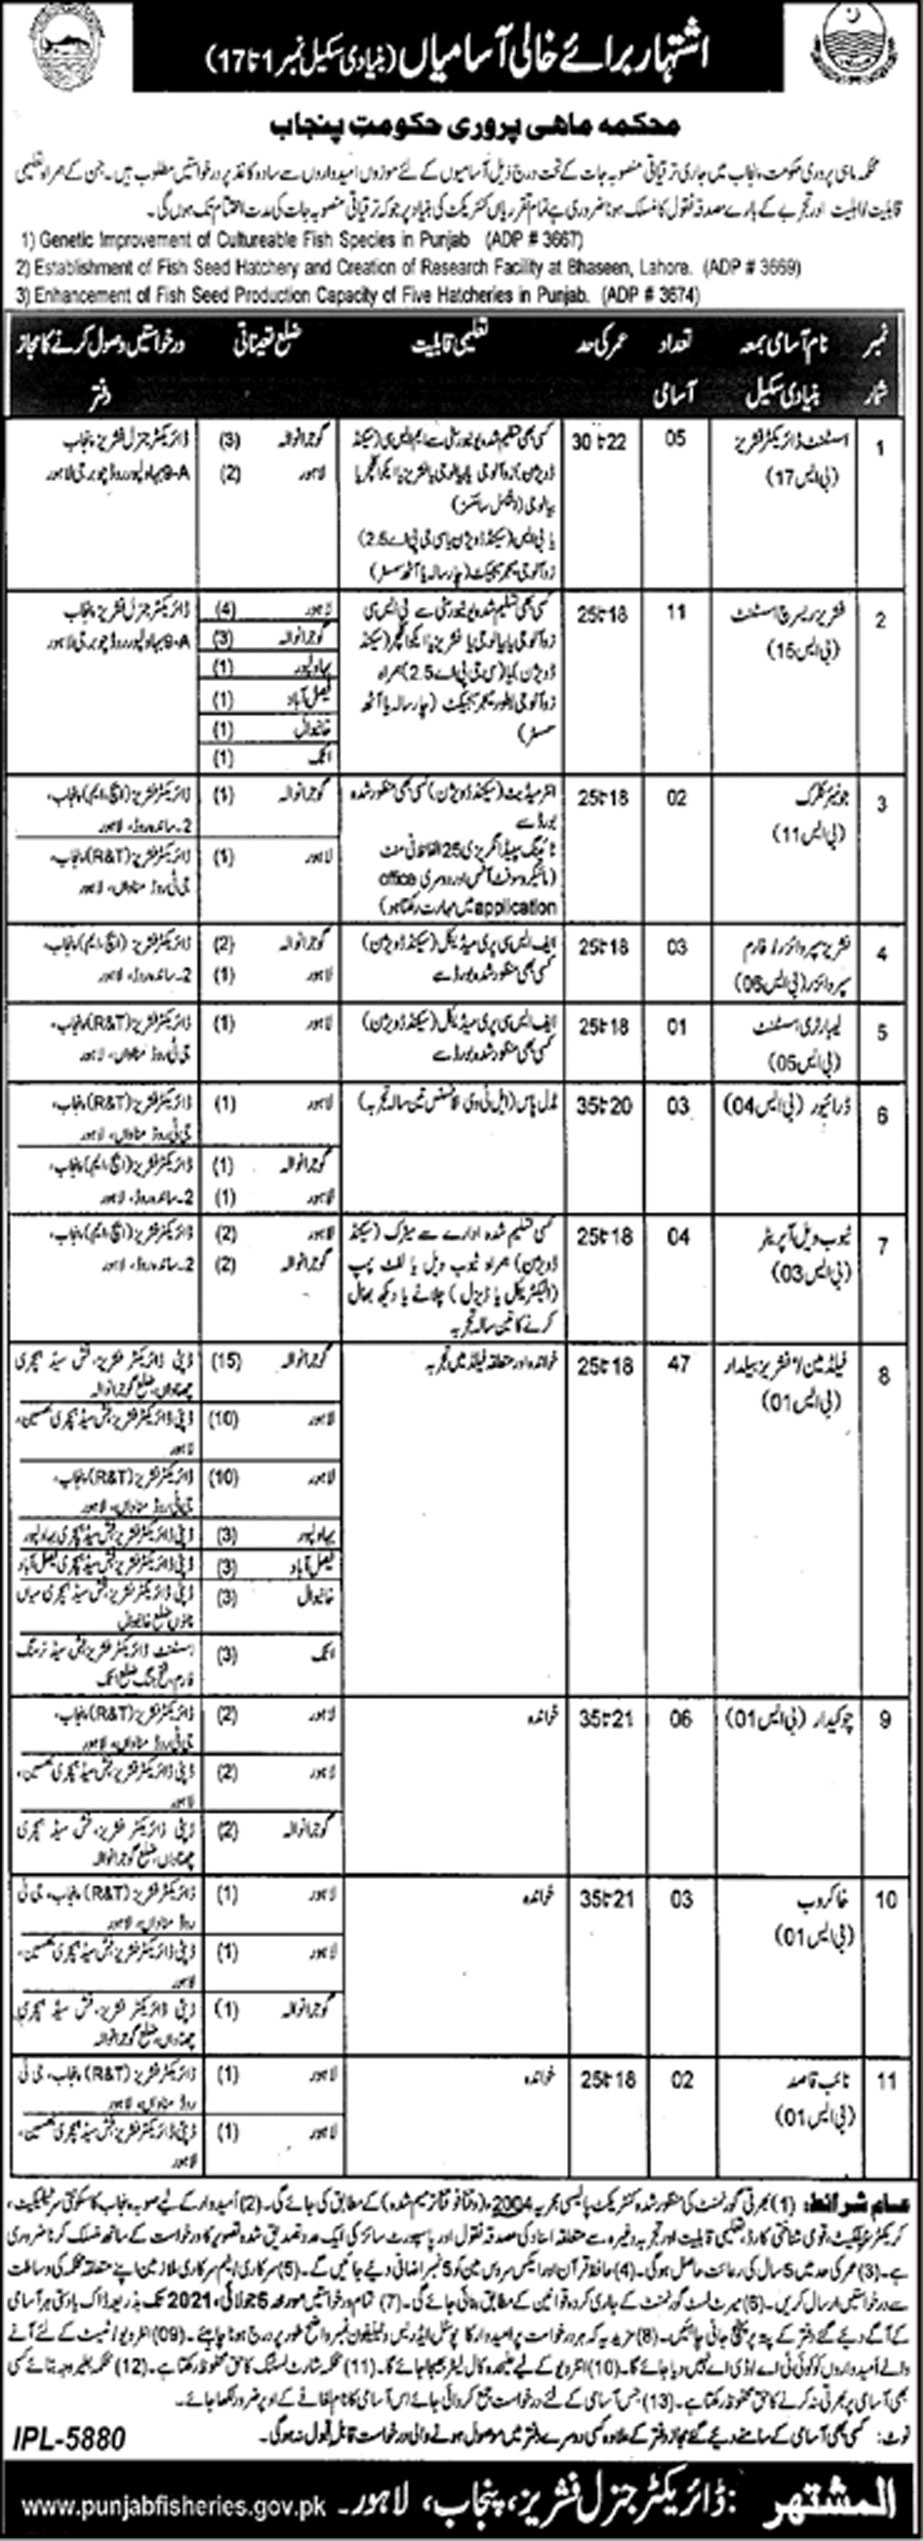 Fisheries Department Punjab Government Jobs June 2021